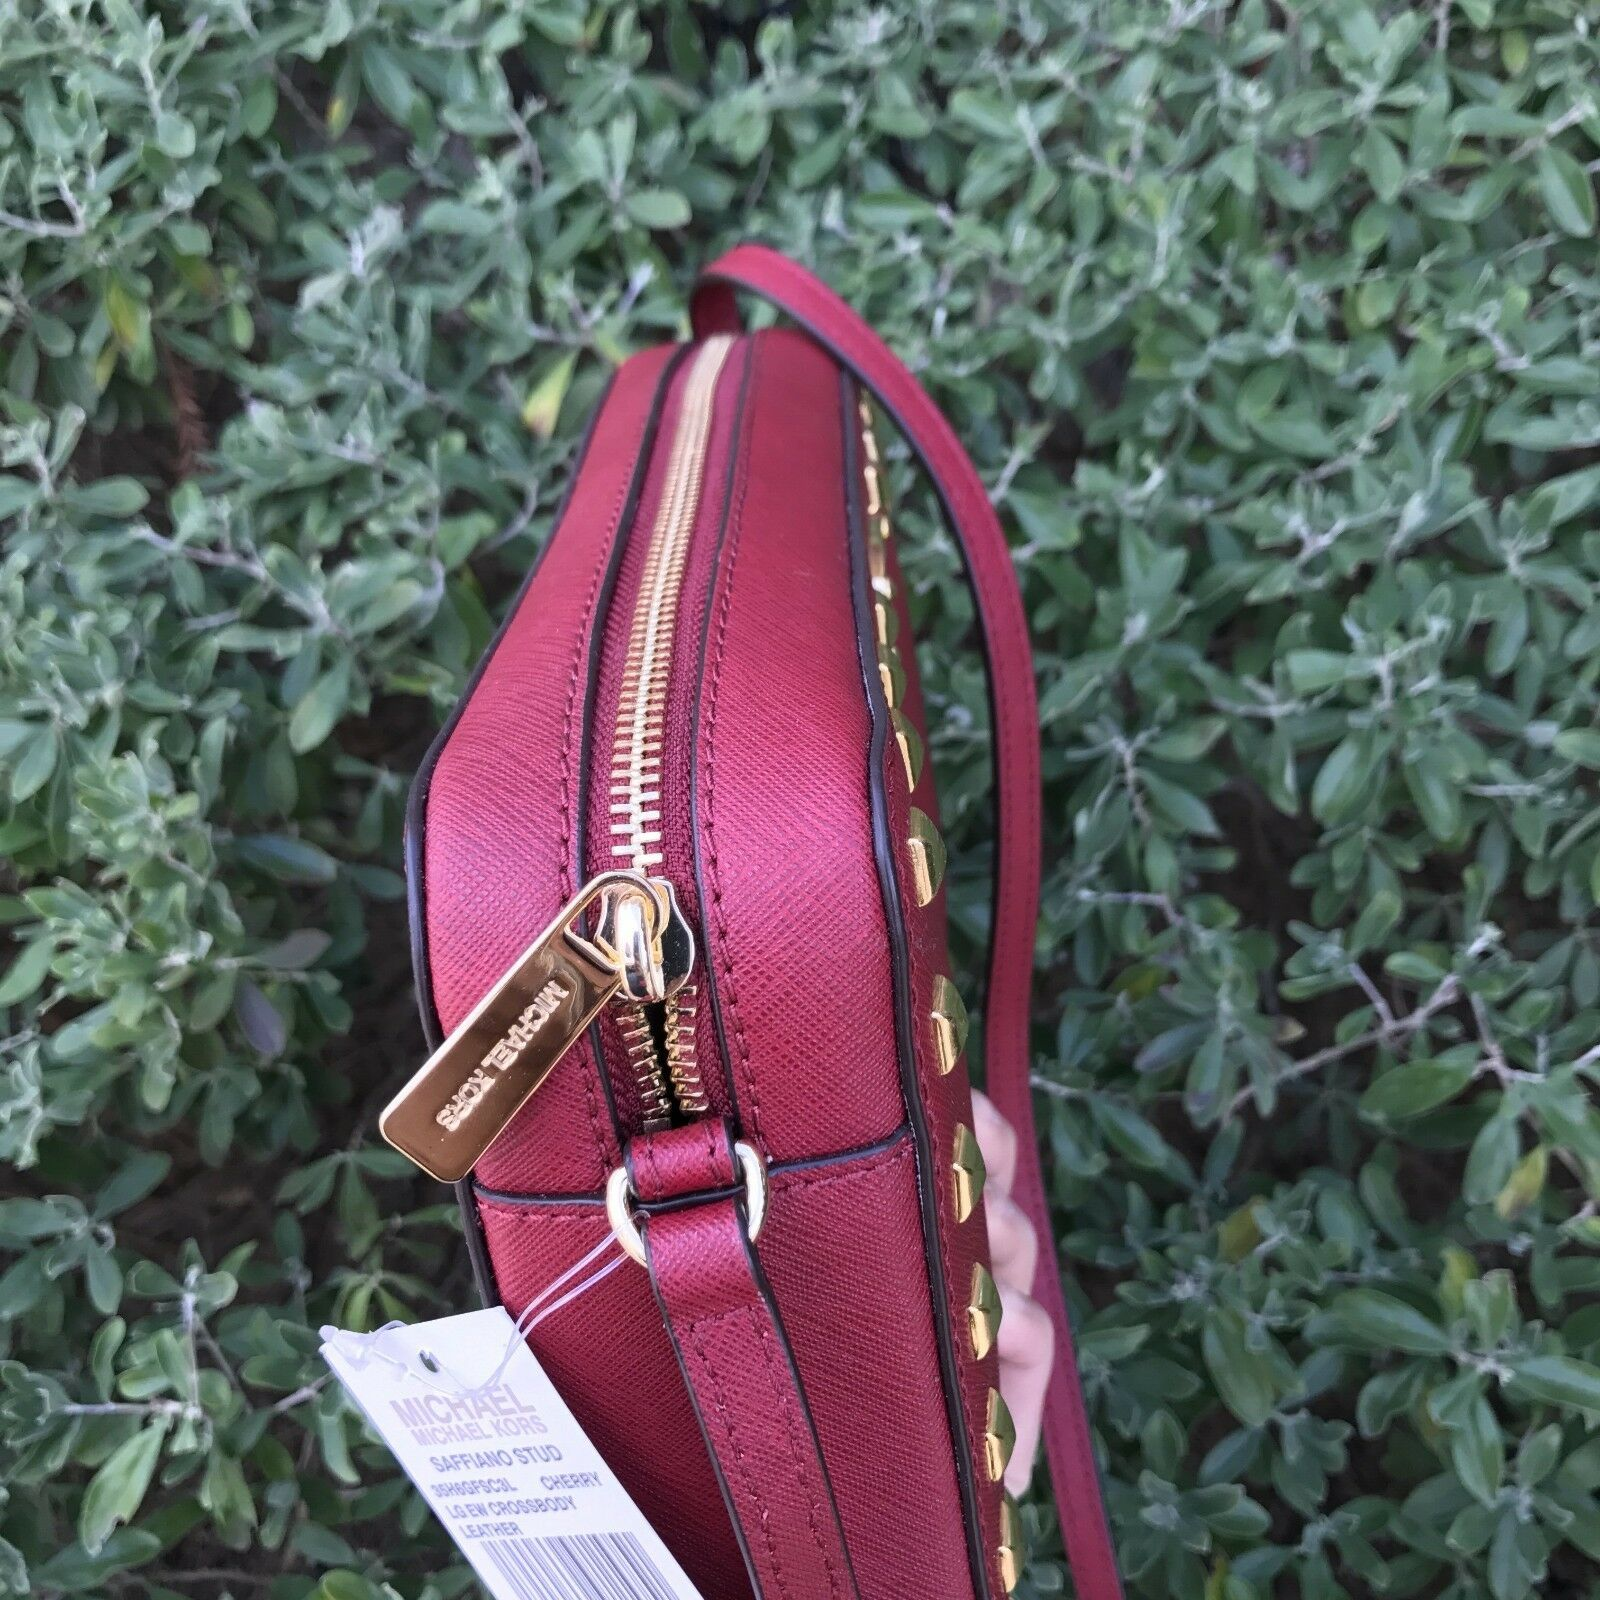 NEW Michael Kors MK Jet Set EW Large Saffiano Leather Stud Crossbody Bag Cherry